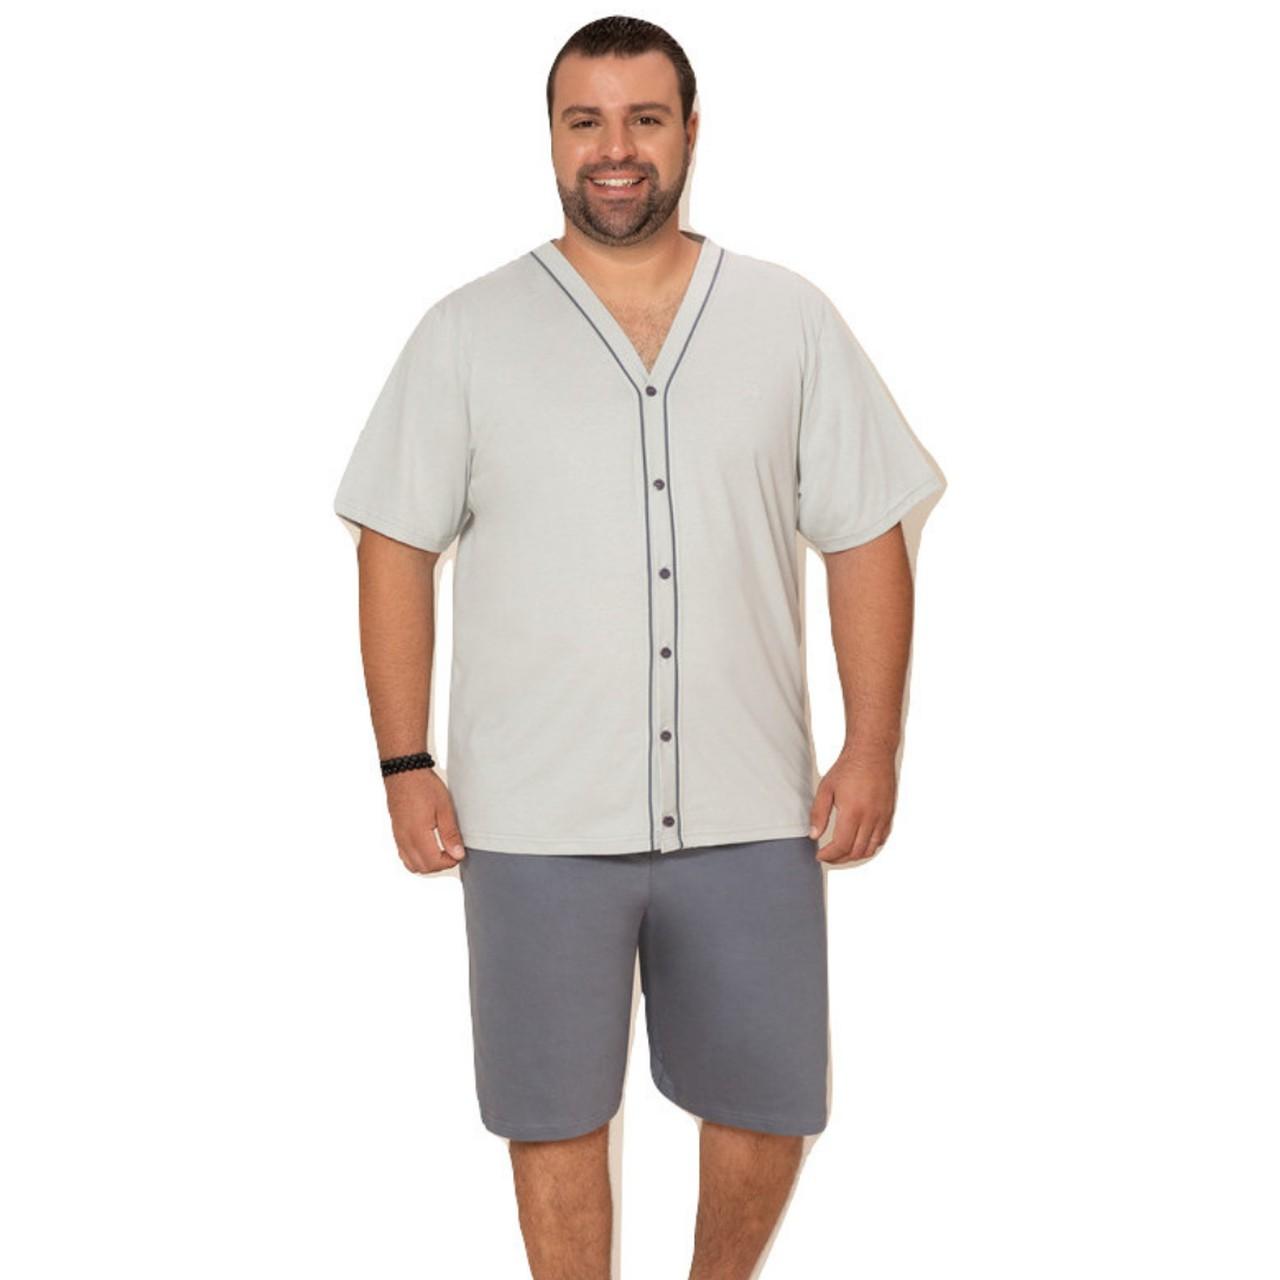 Pijama masculino plus size verão blusa abertura frontal